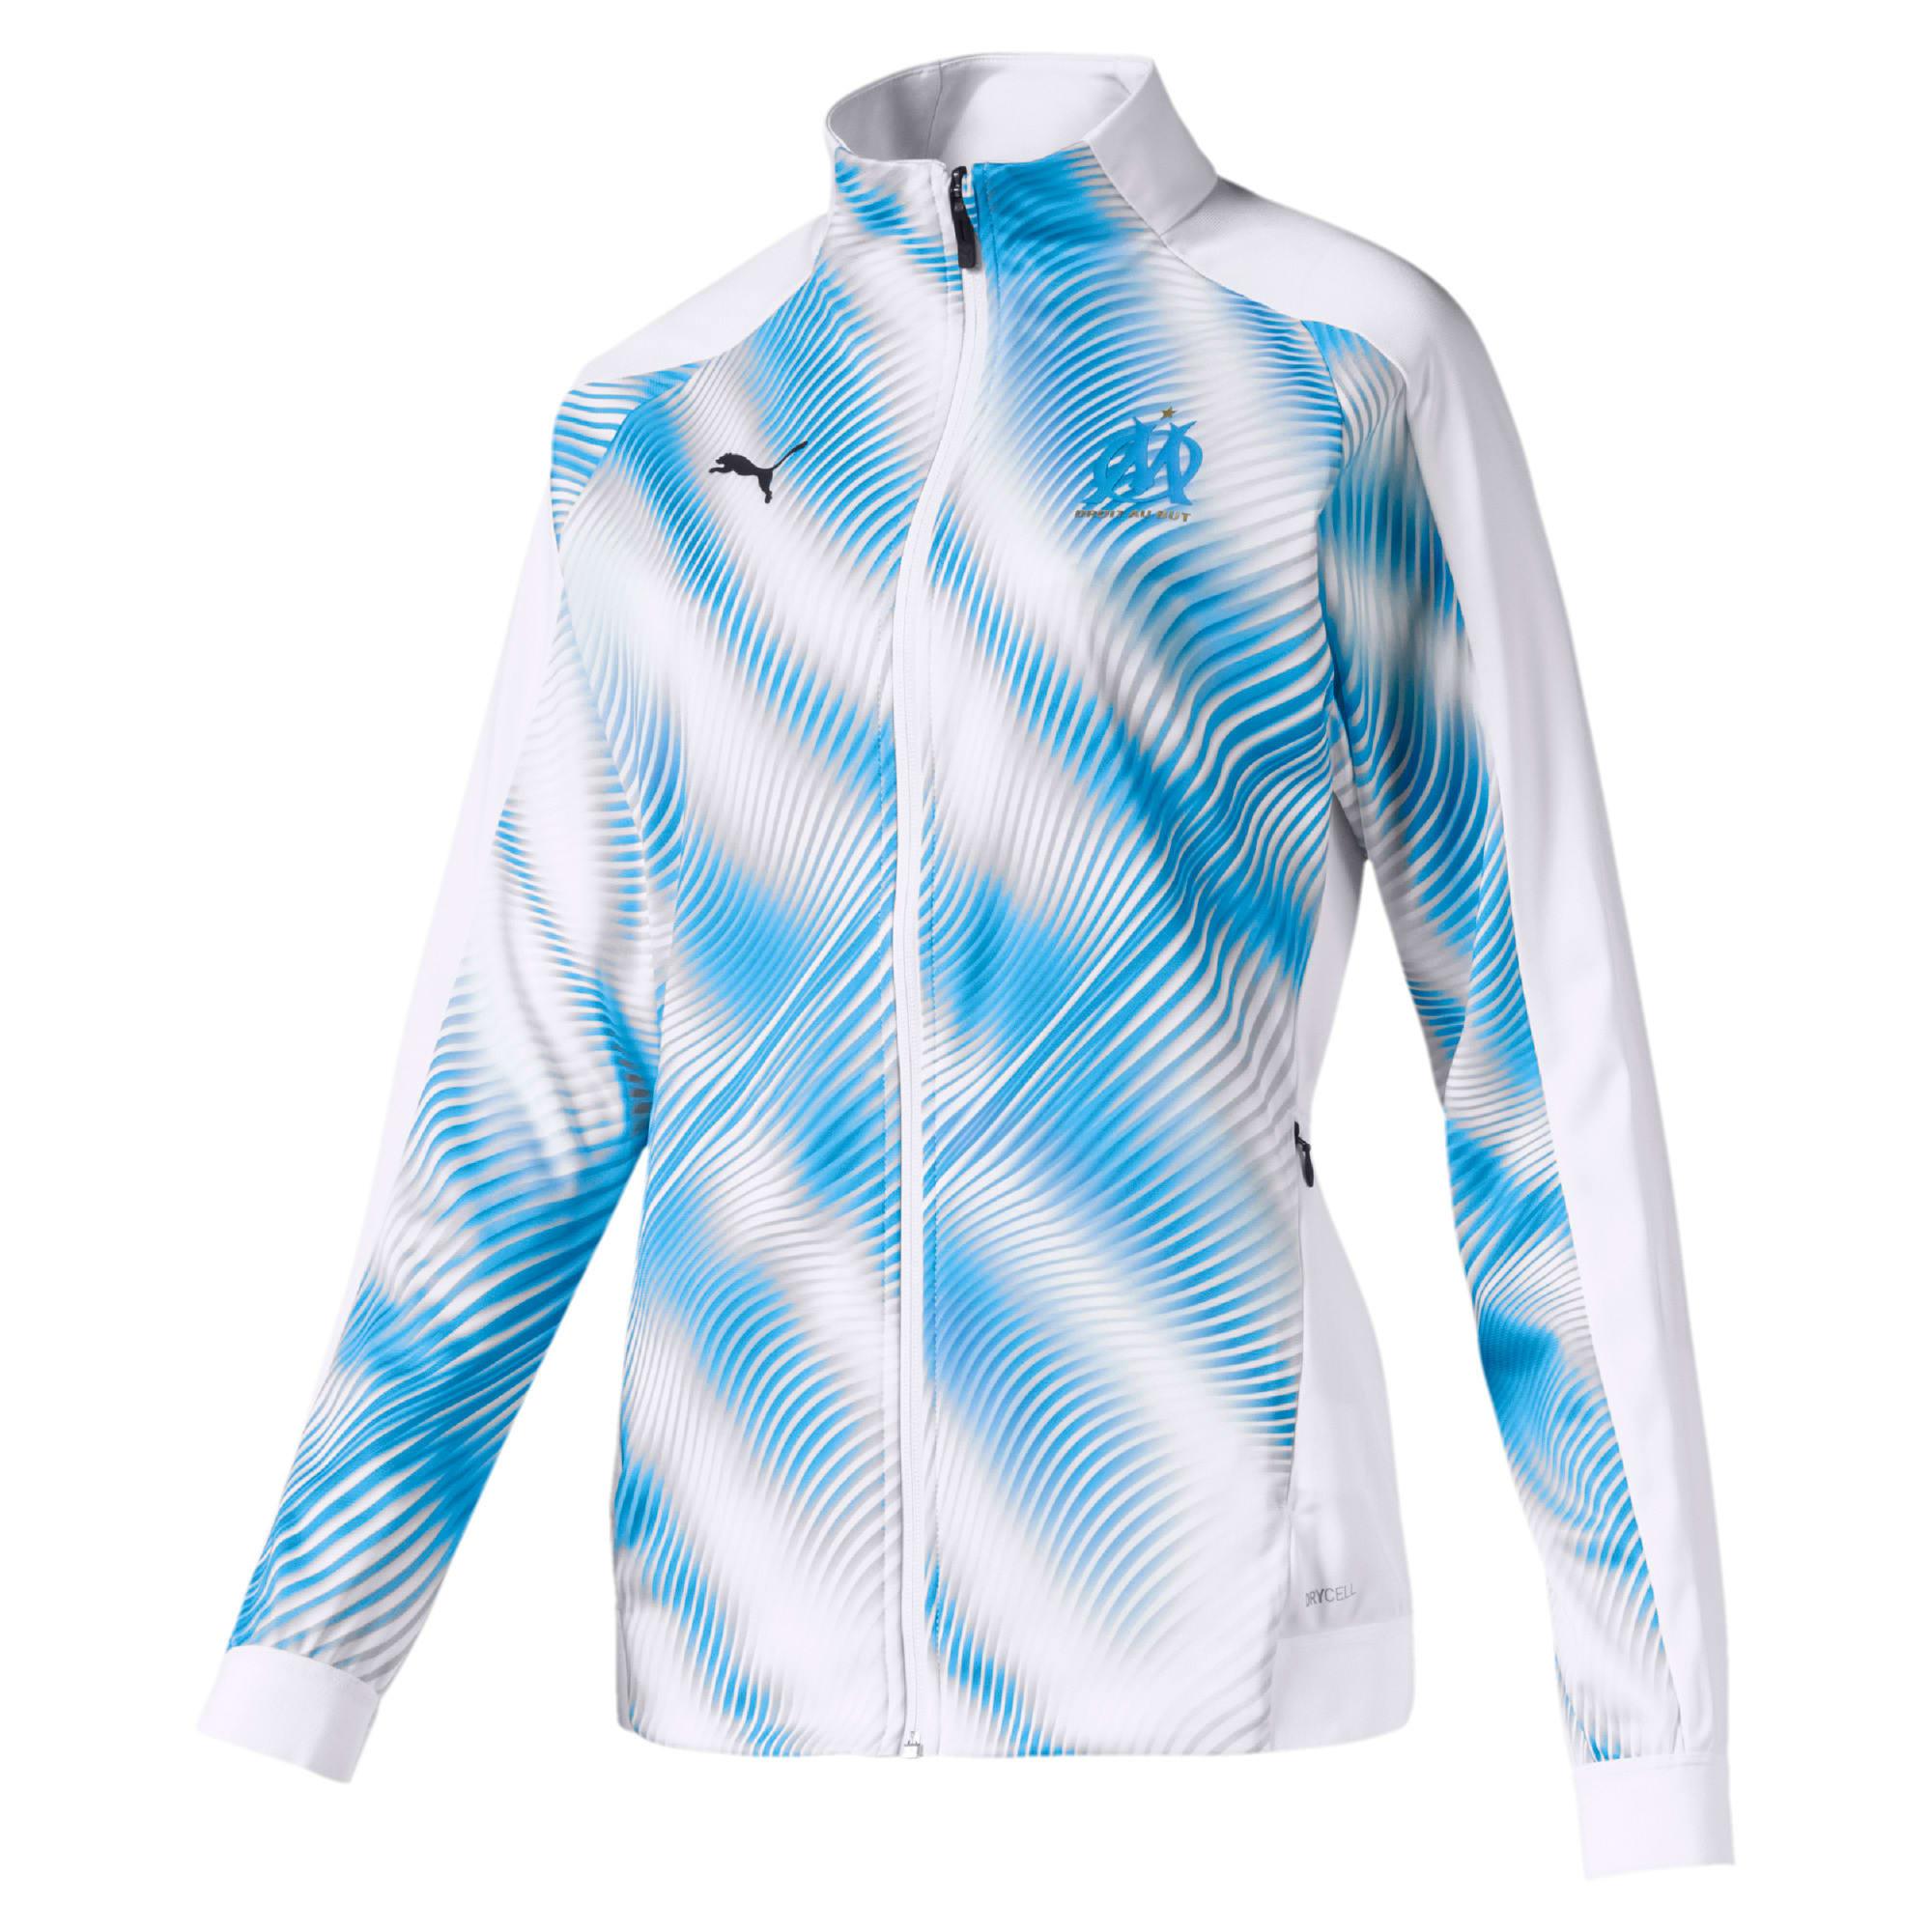 Thumbnail 1 of Olympique de Marseille Stadium Women's Replica Jacket, Puma White-Bleu Azur, medium